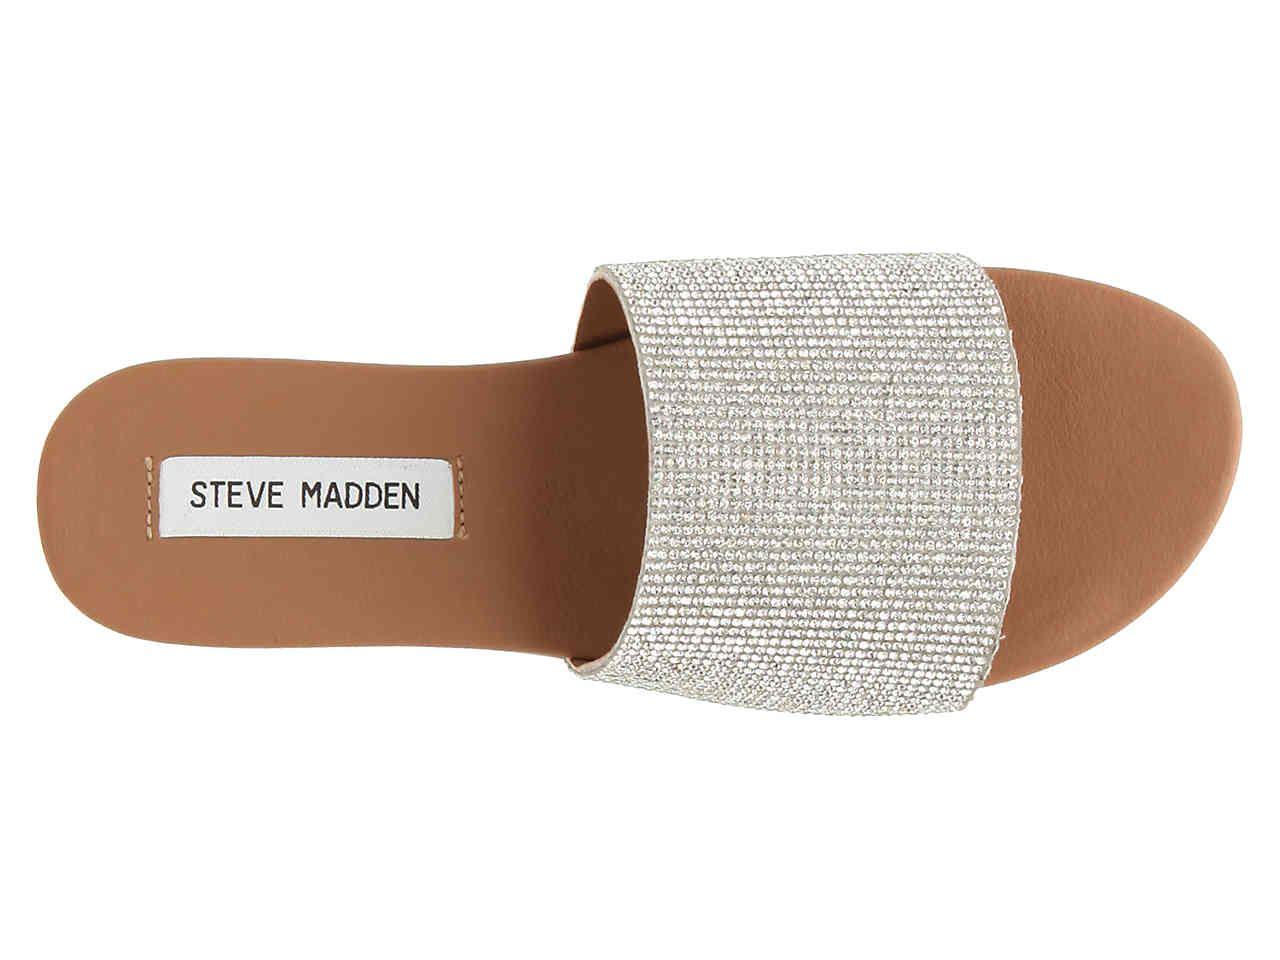 Rhinestone sandals, Sandals, Steve madden